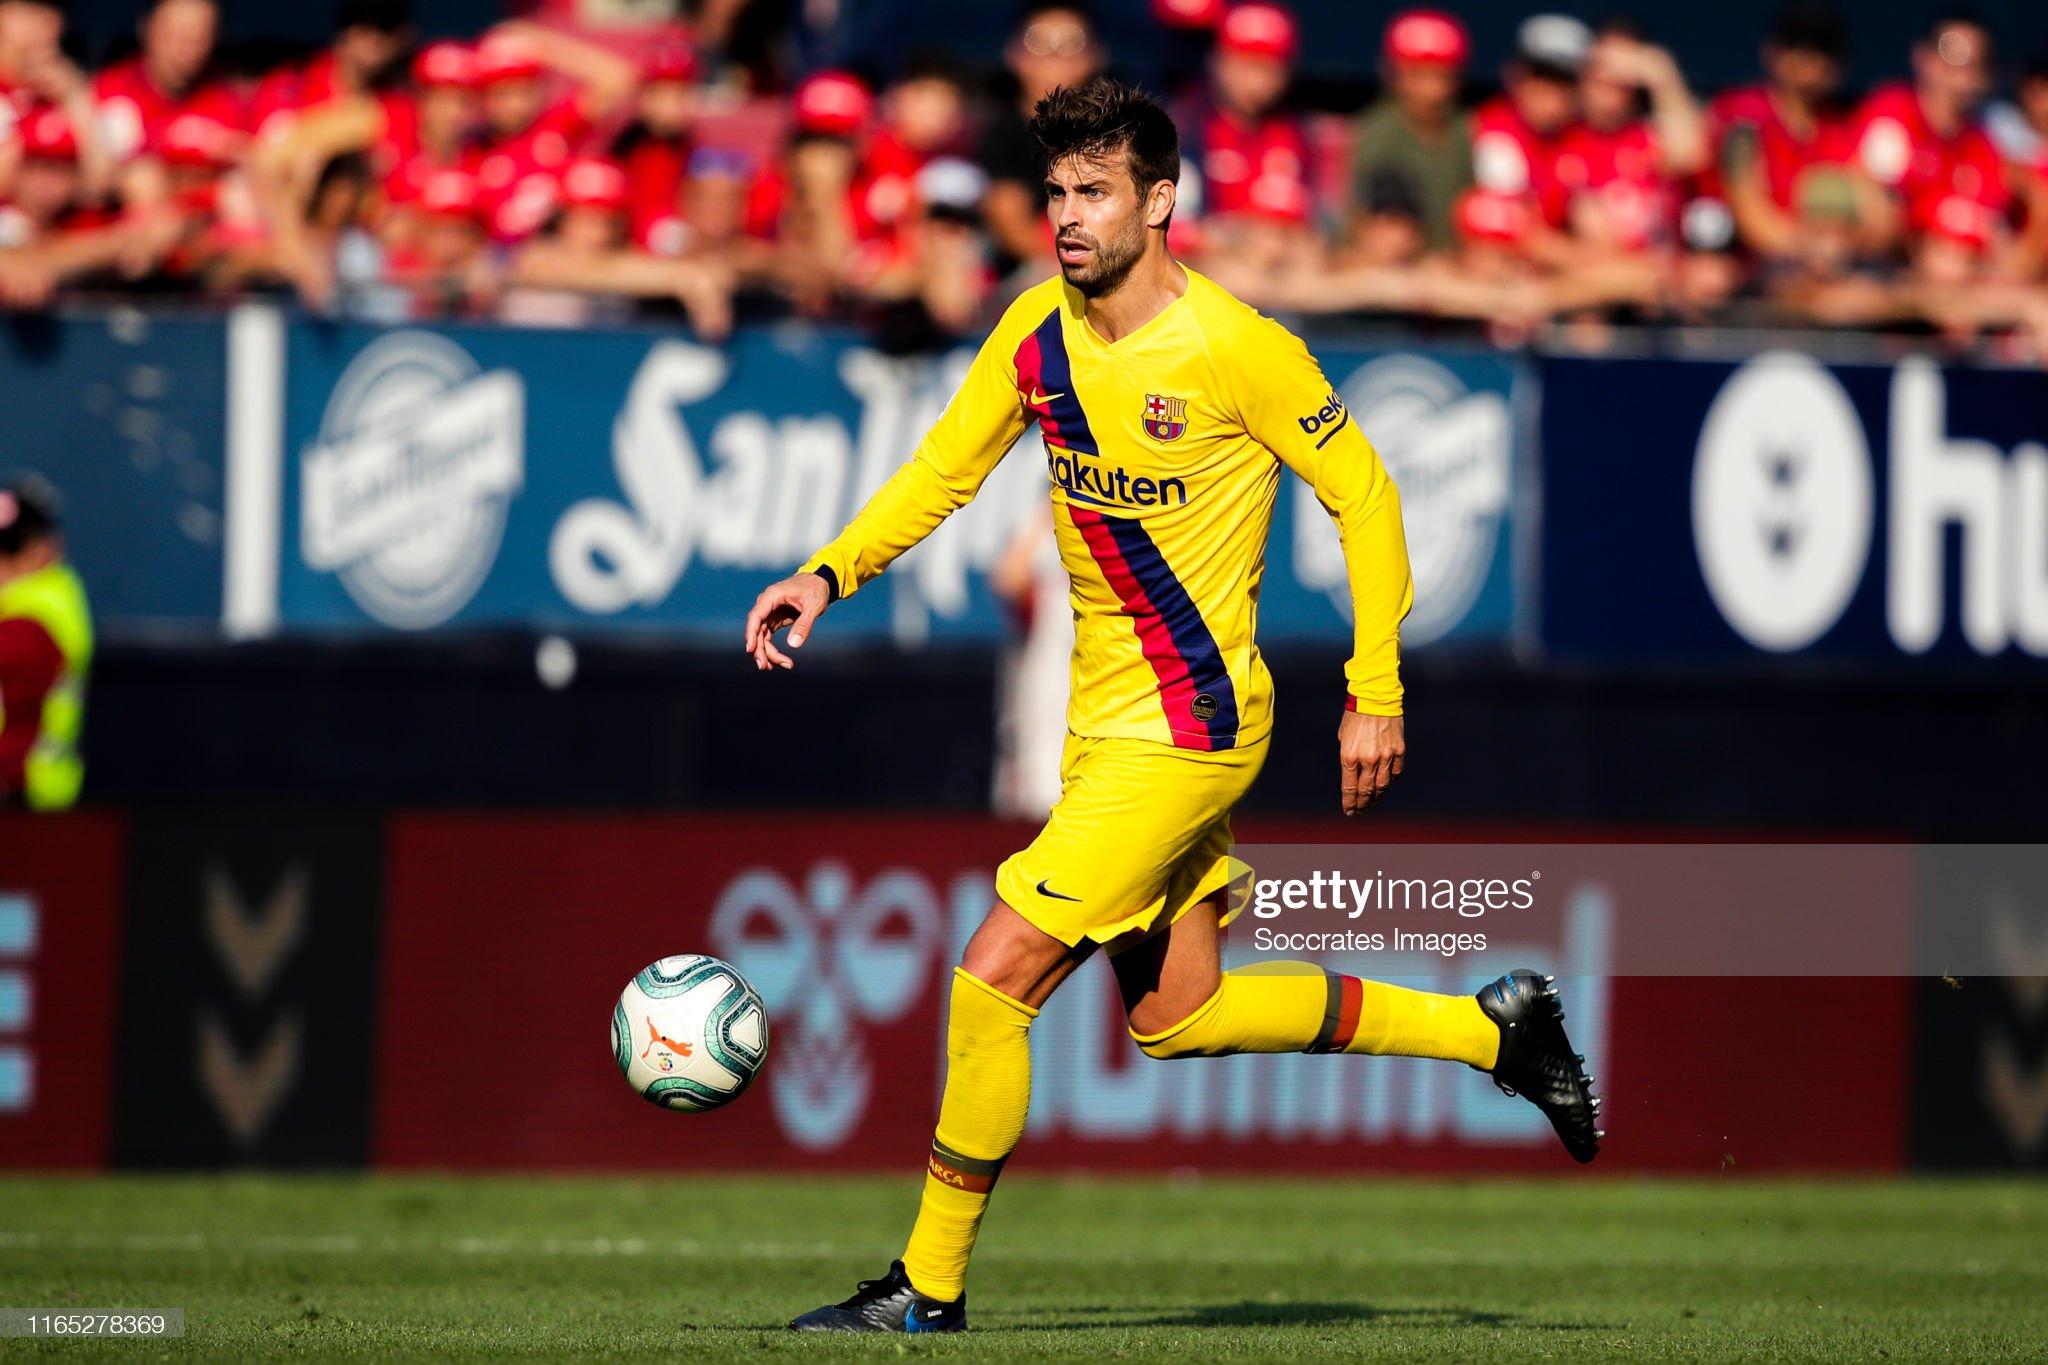 صور مباراة : أوساسونا - برشلونة 2-2 ( 31-08-2019 )  Gerard-pique-of-fc-barcelona-during-the-la-liga-santander-match-v-picture-id1165278369?s=2048x2048